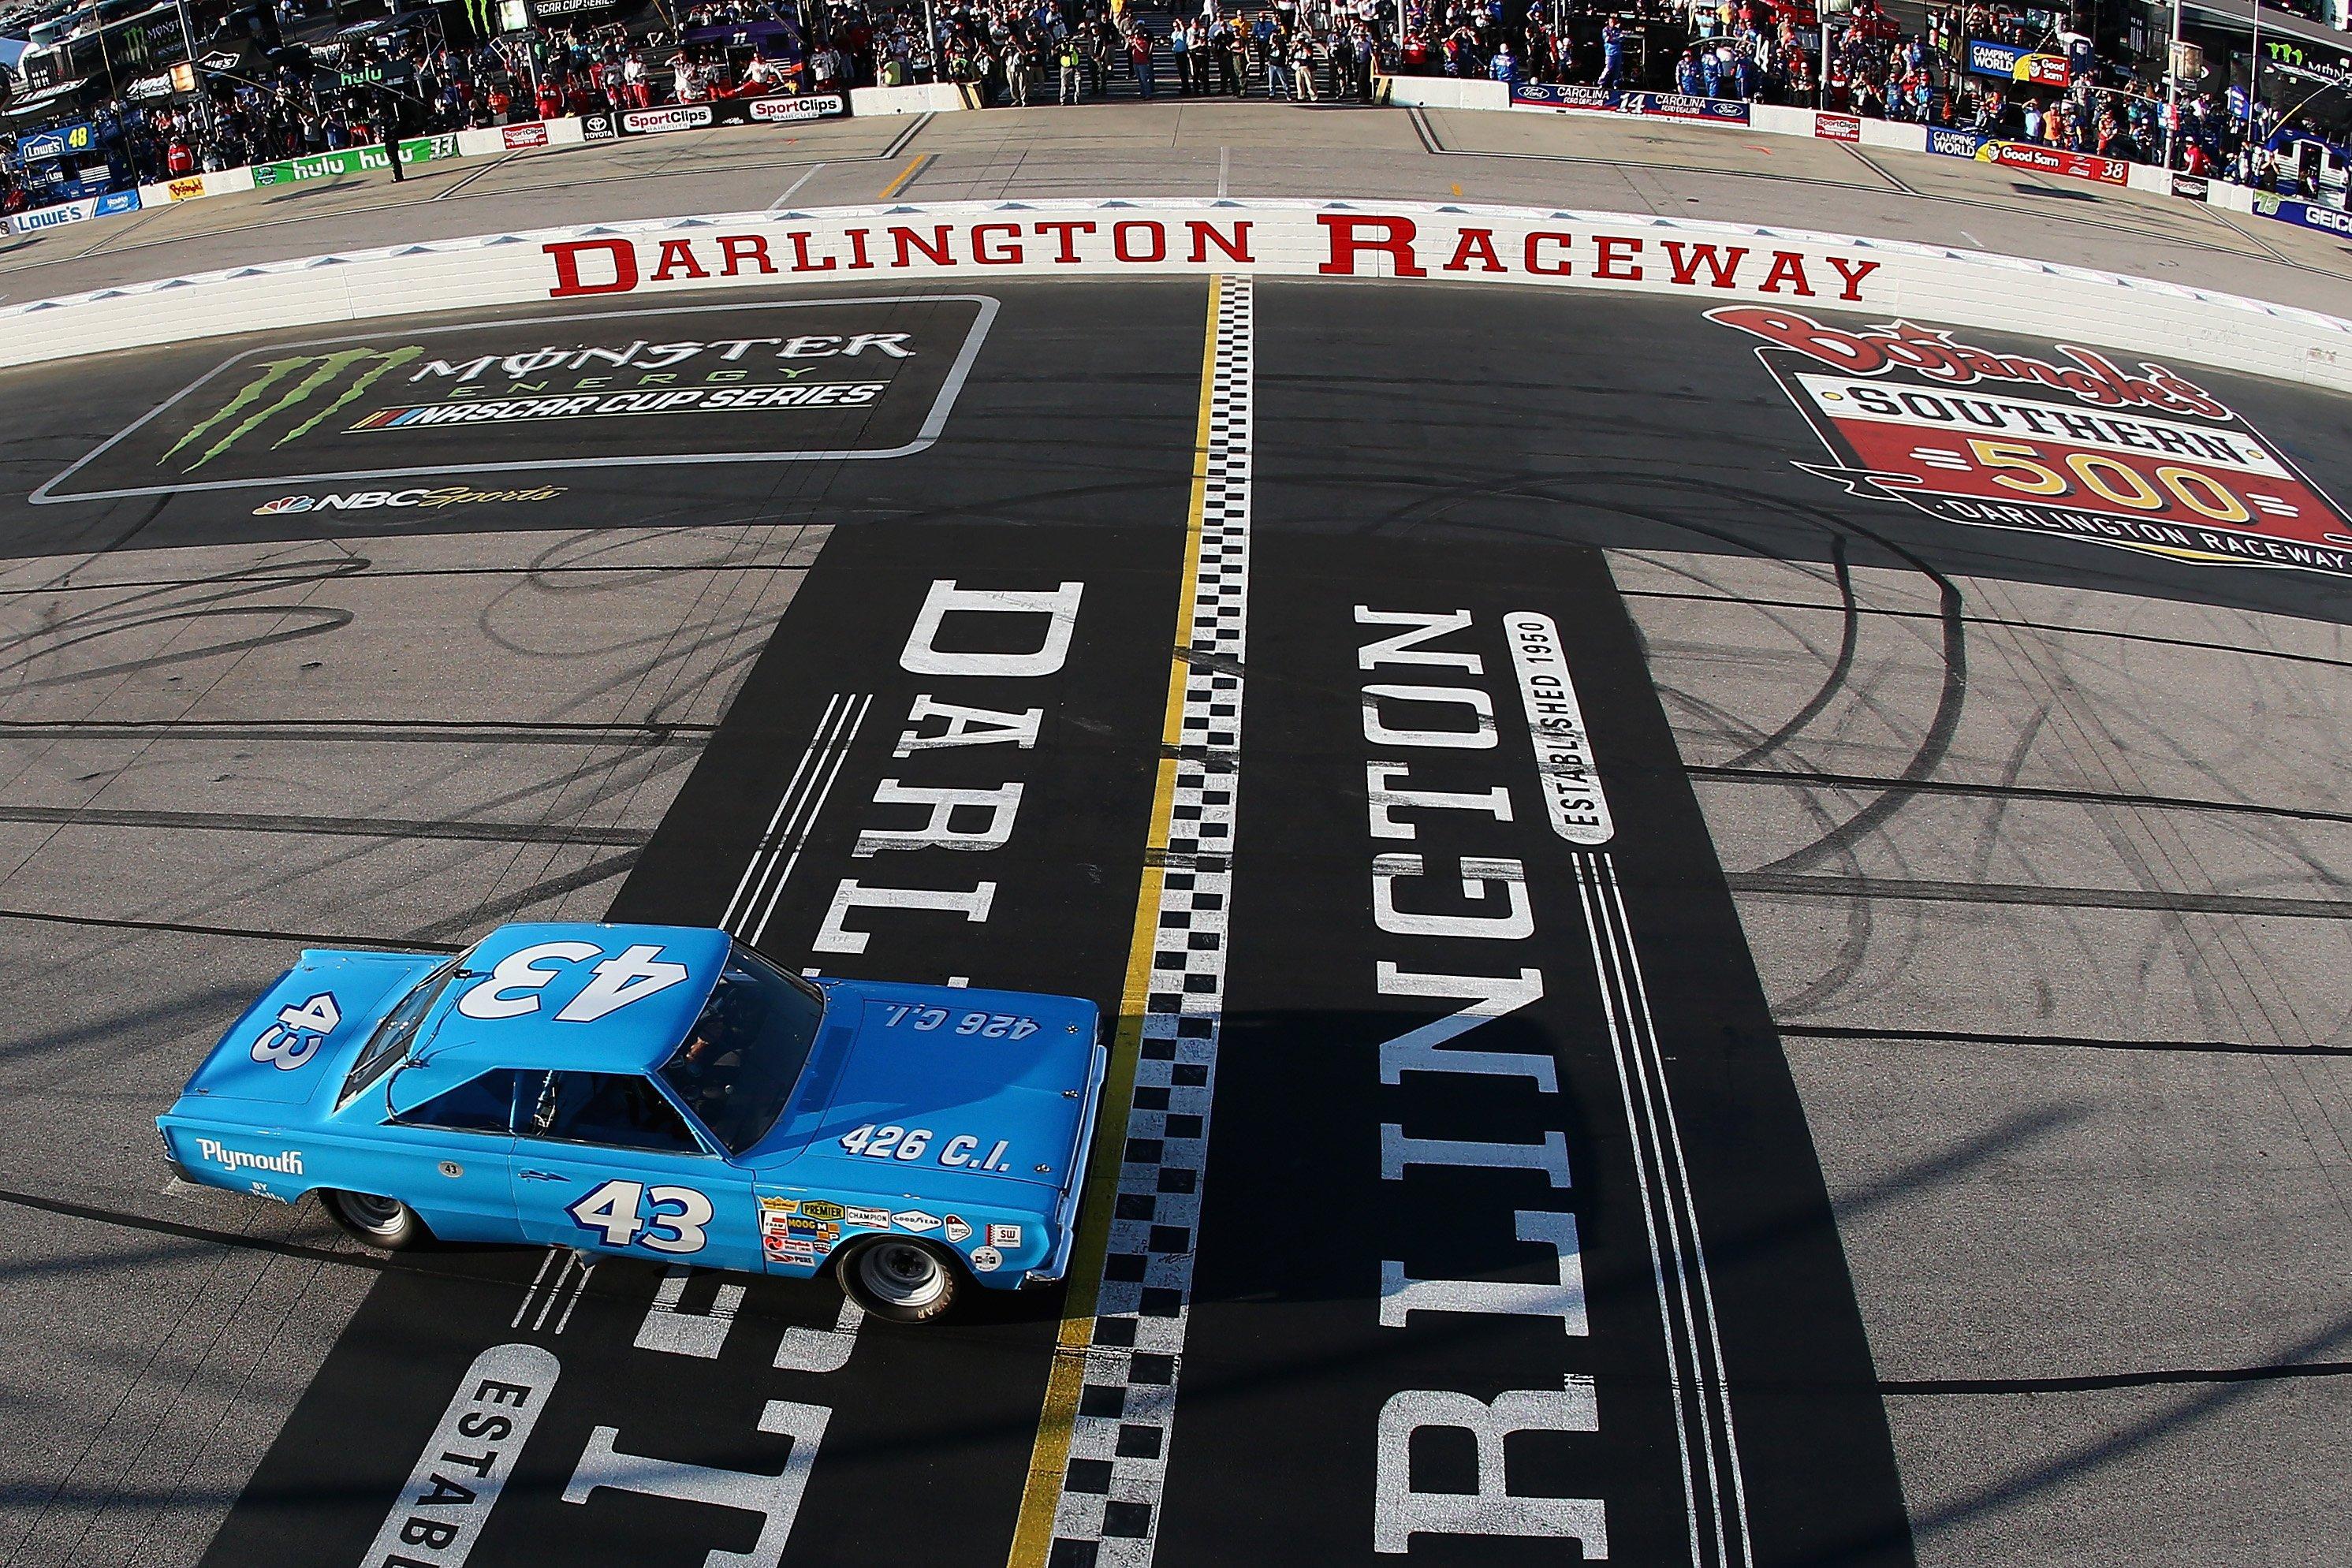 Richard Petty at Darlignton Raceway